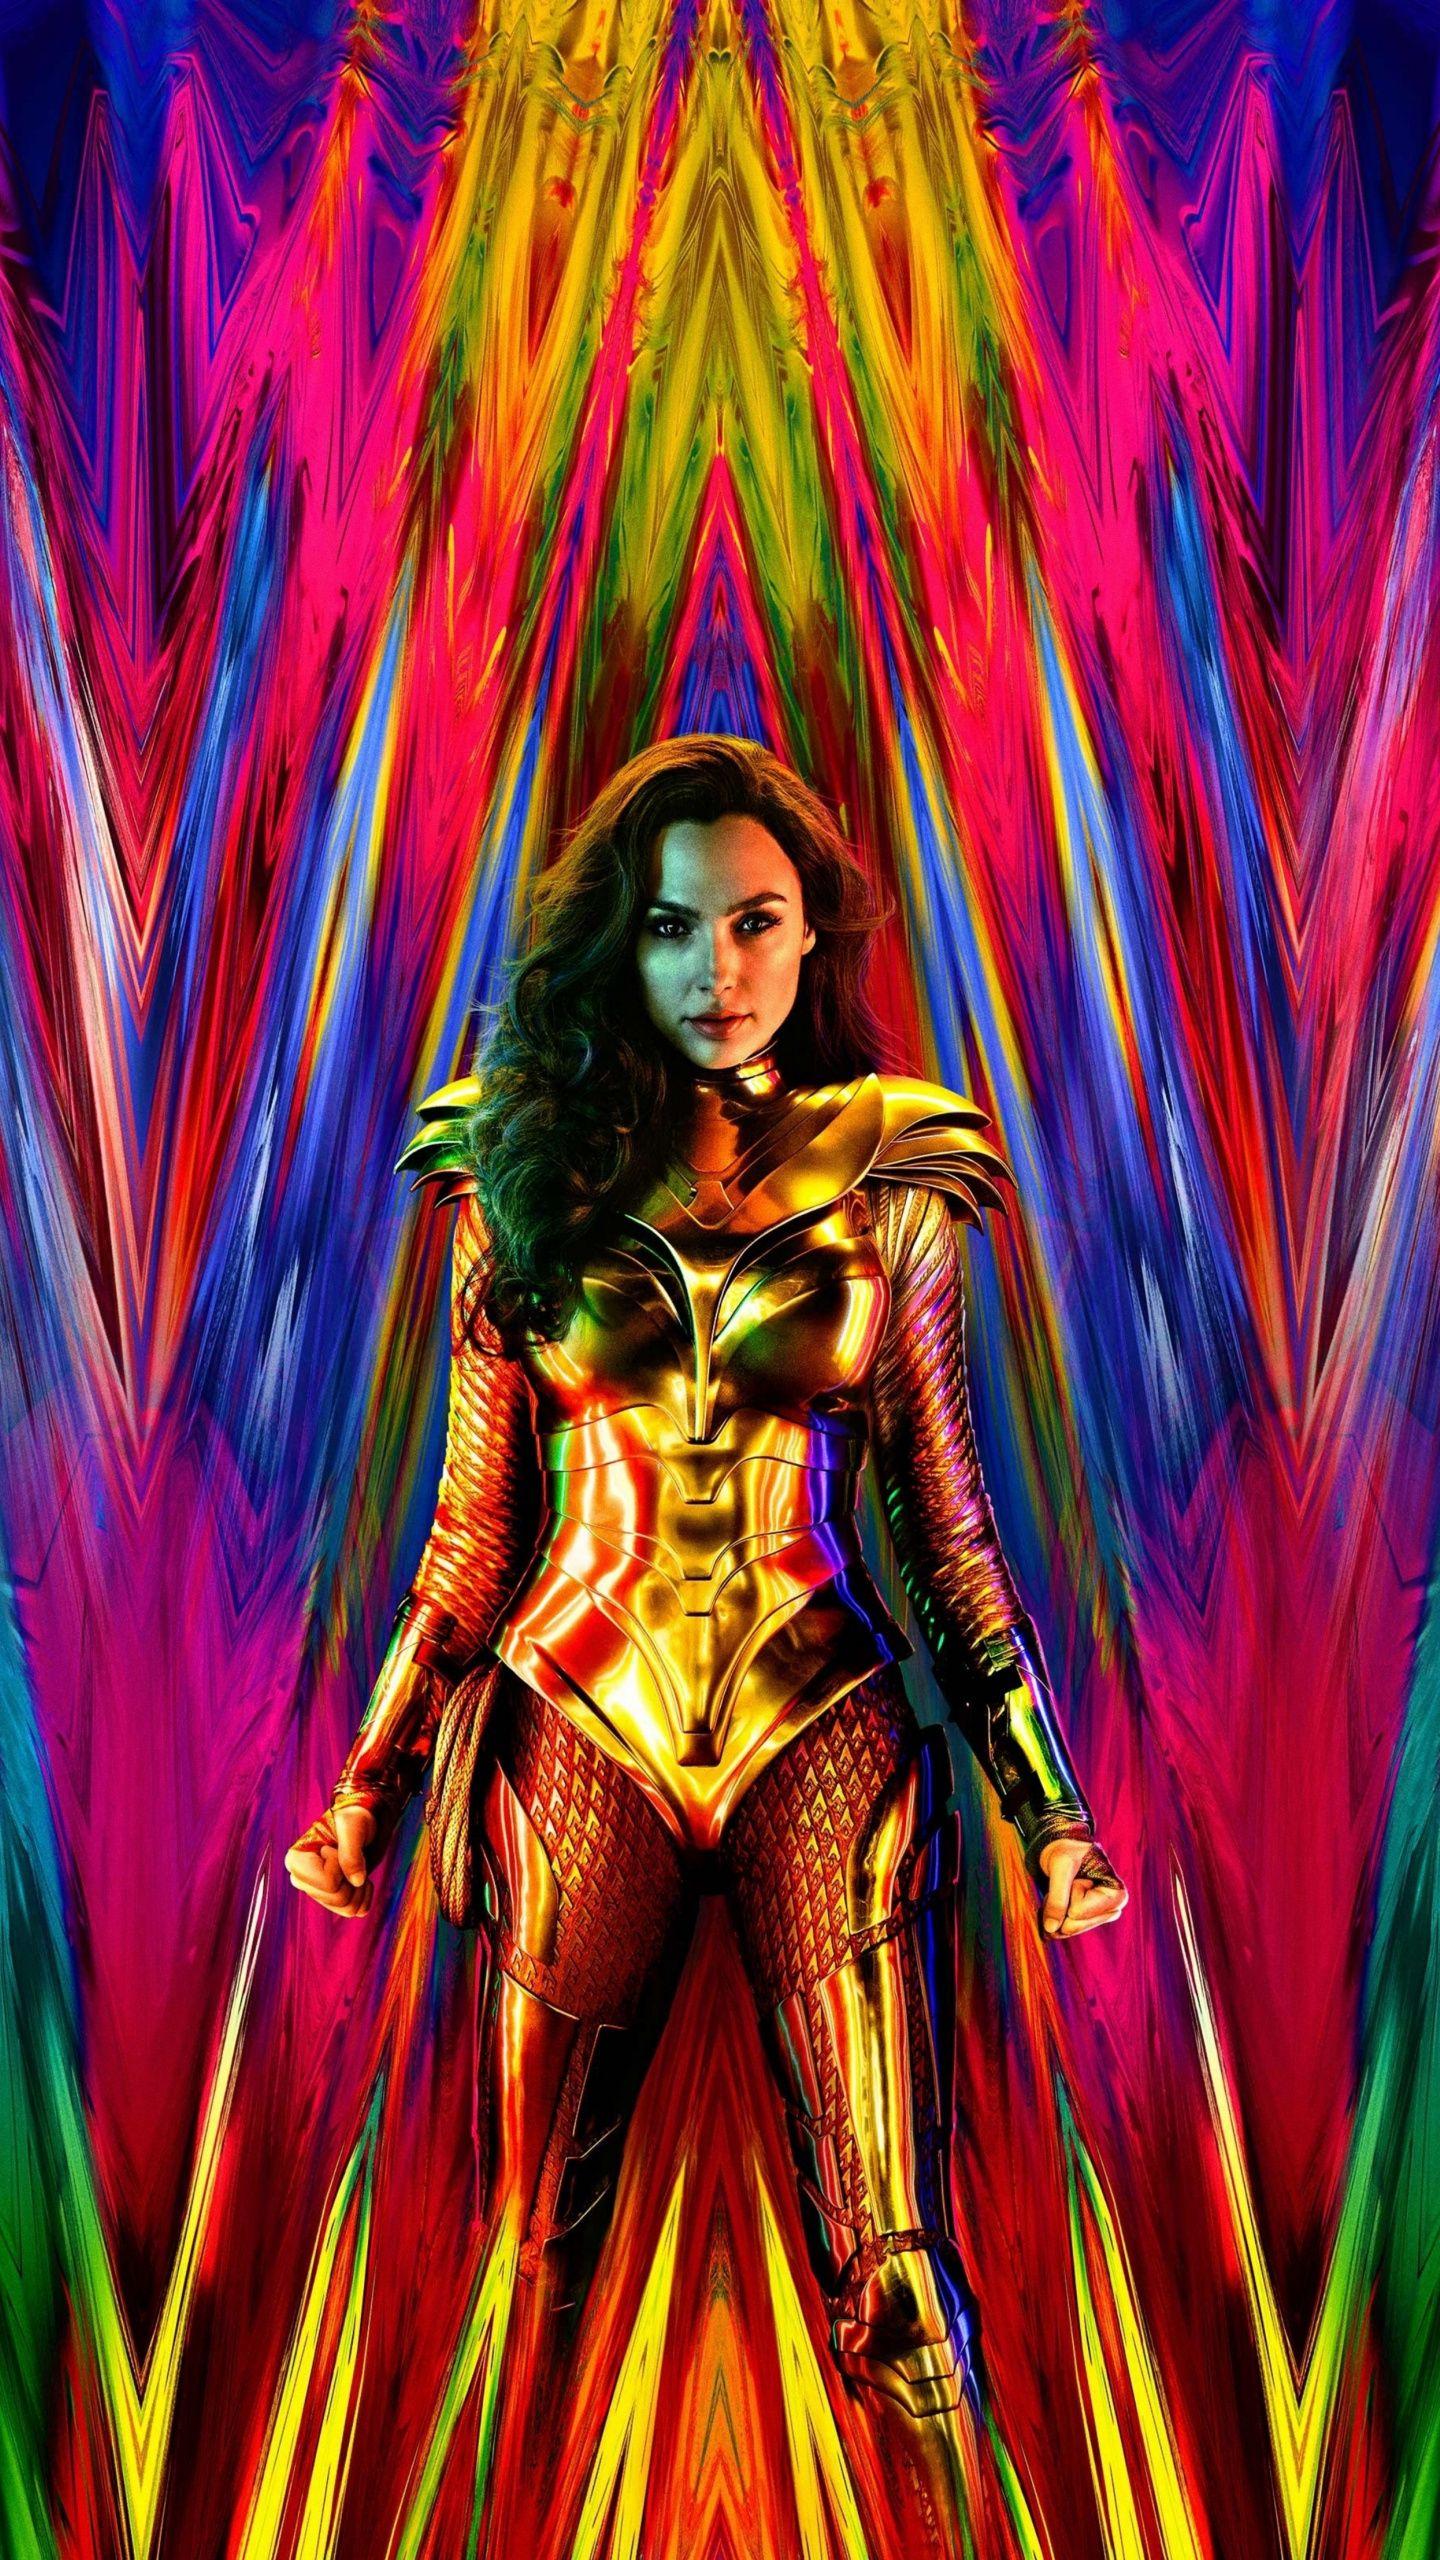 1440x2560 Wonder Woman 1984 Gal Gadot 2020 wallpaper Gal gadot 1440x2560